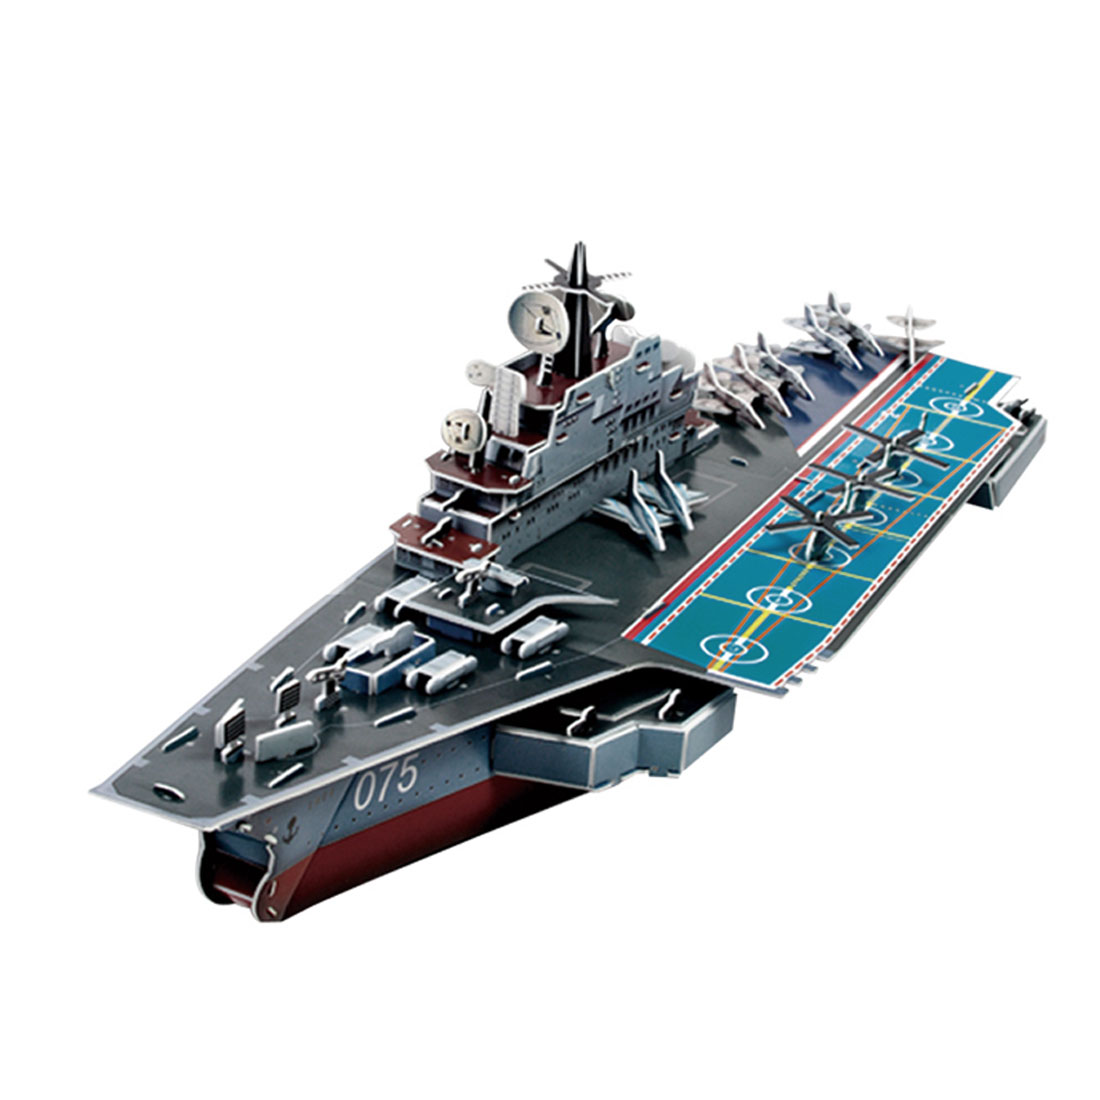 3D Foam Kiev Aircraft Carrier Model Assembling Puzzle Toy